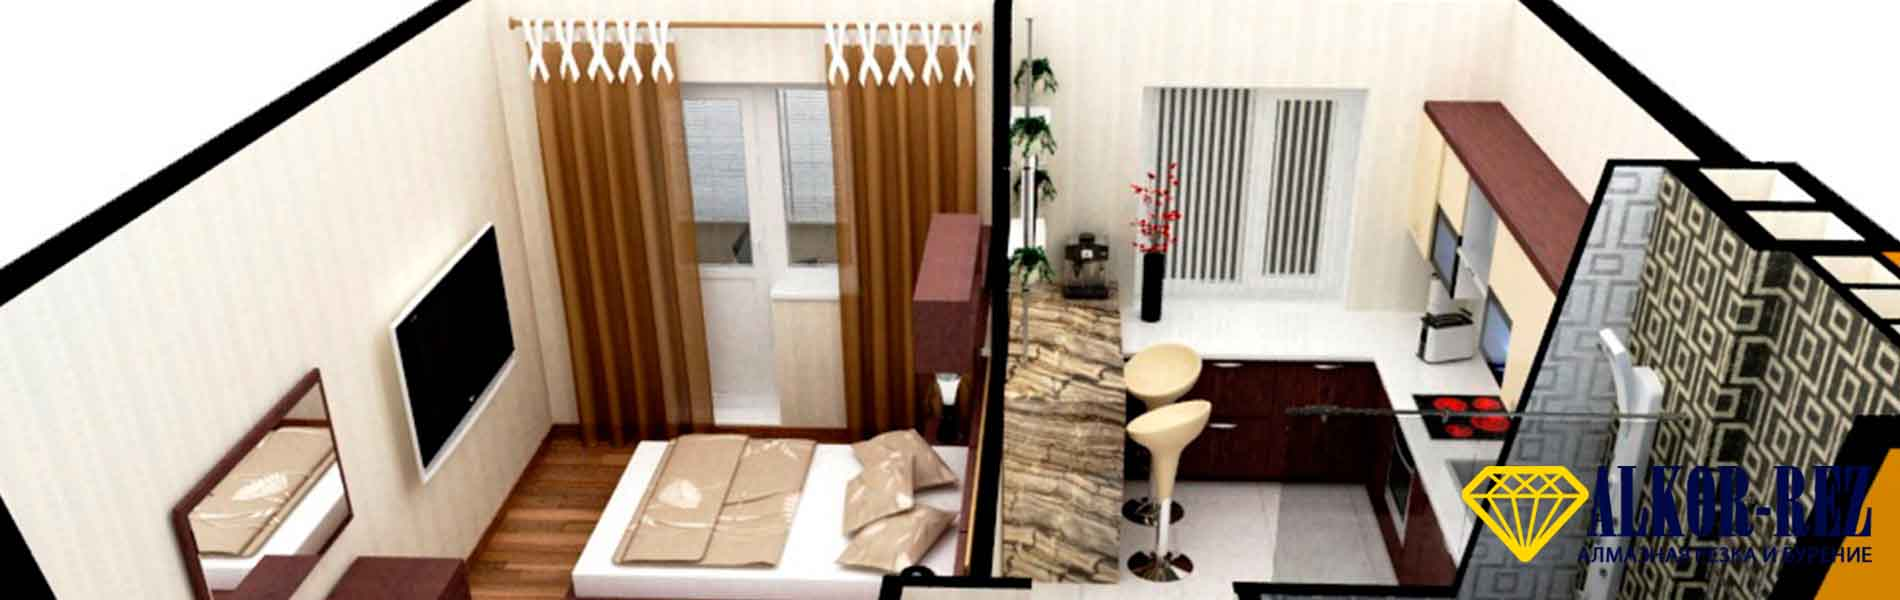 Как сделать из 1к кв 2х комнатнуюРемонт однокомнатной квартирыИз однушки двушкаРемонт квартир спб